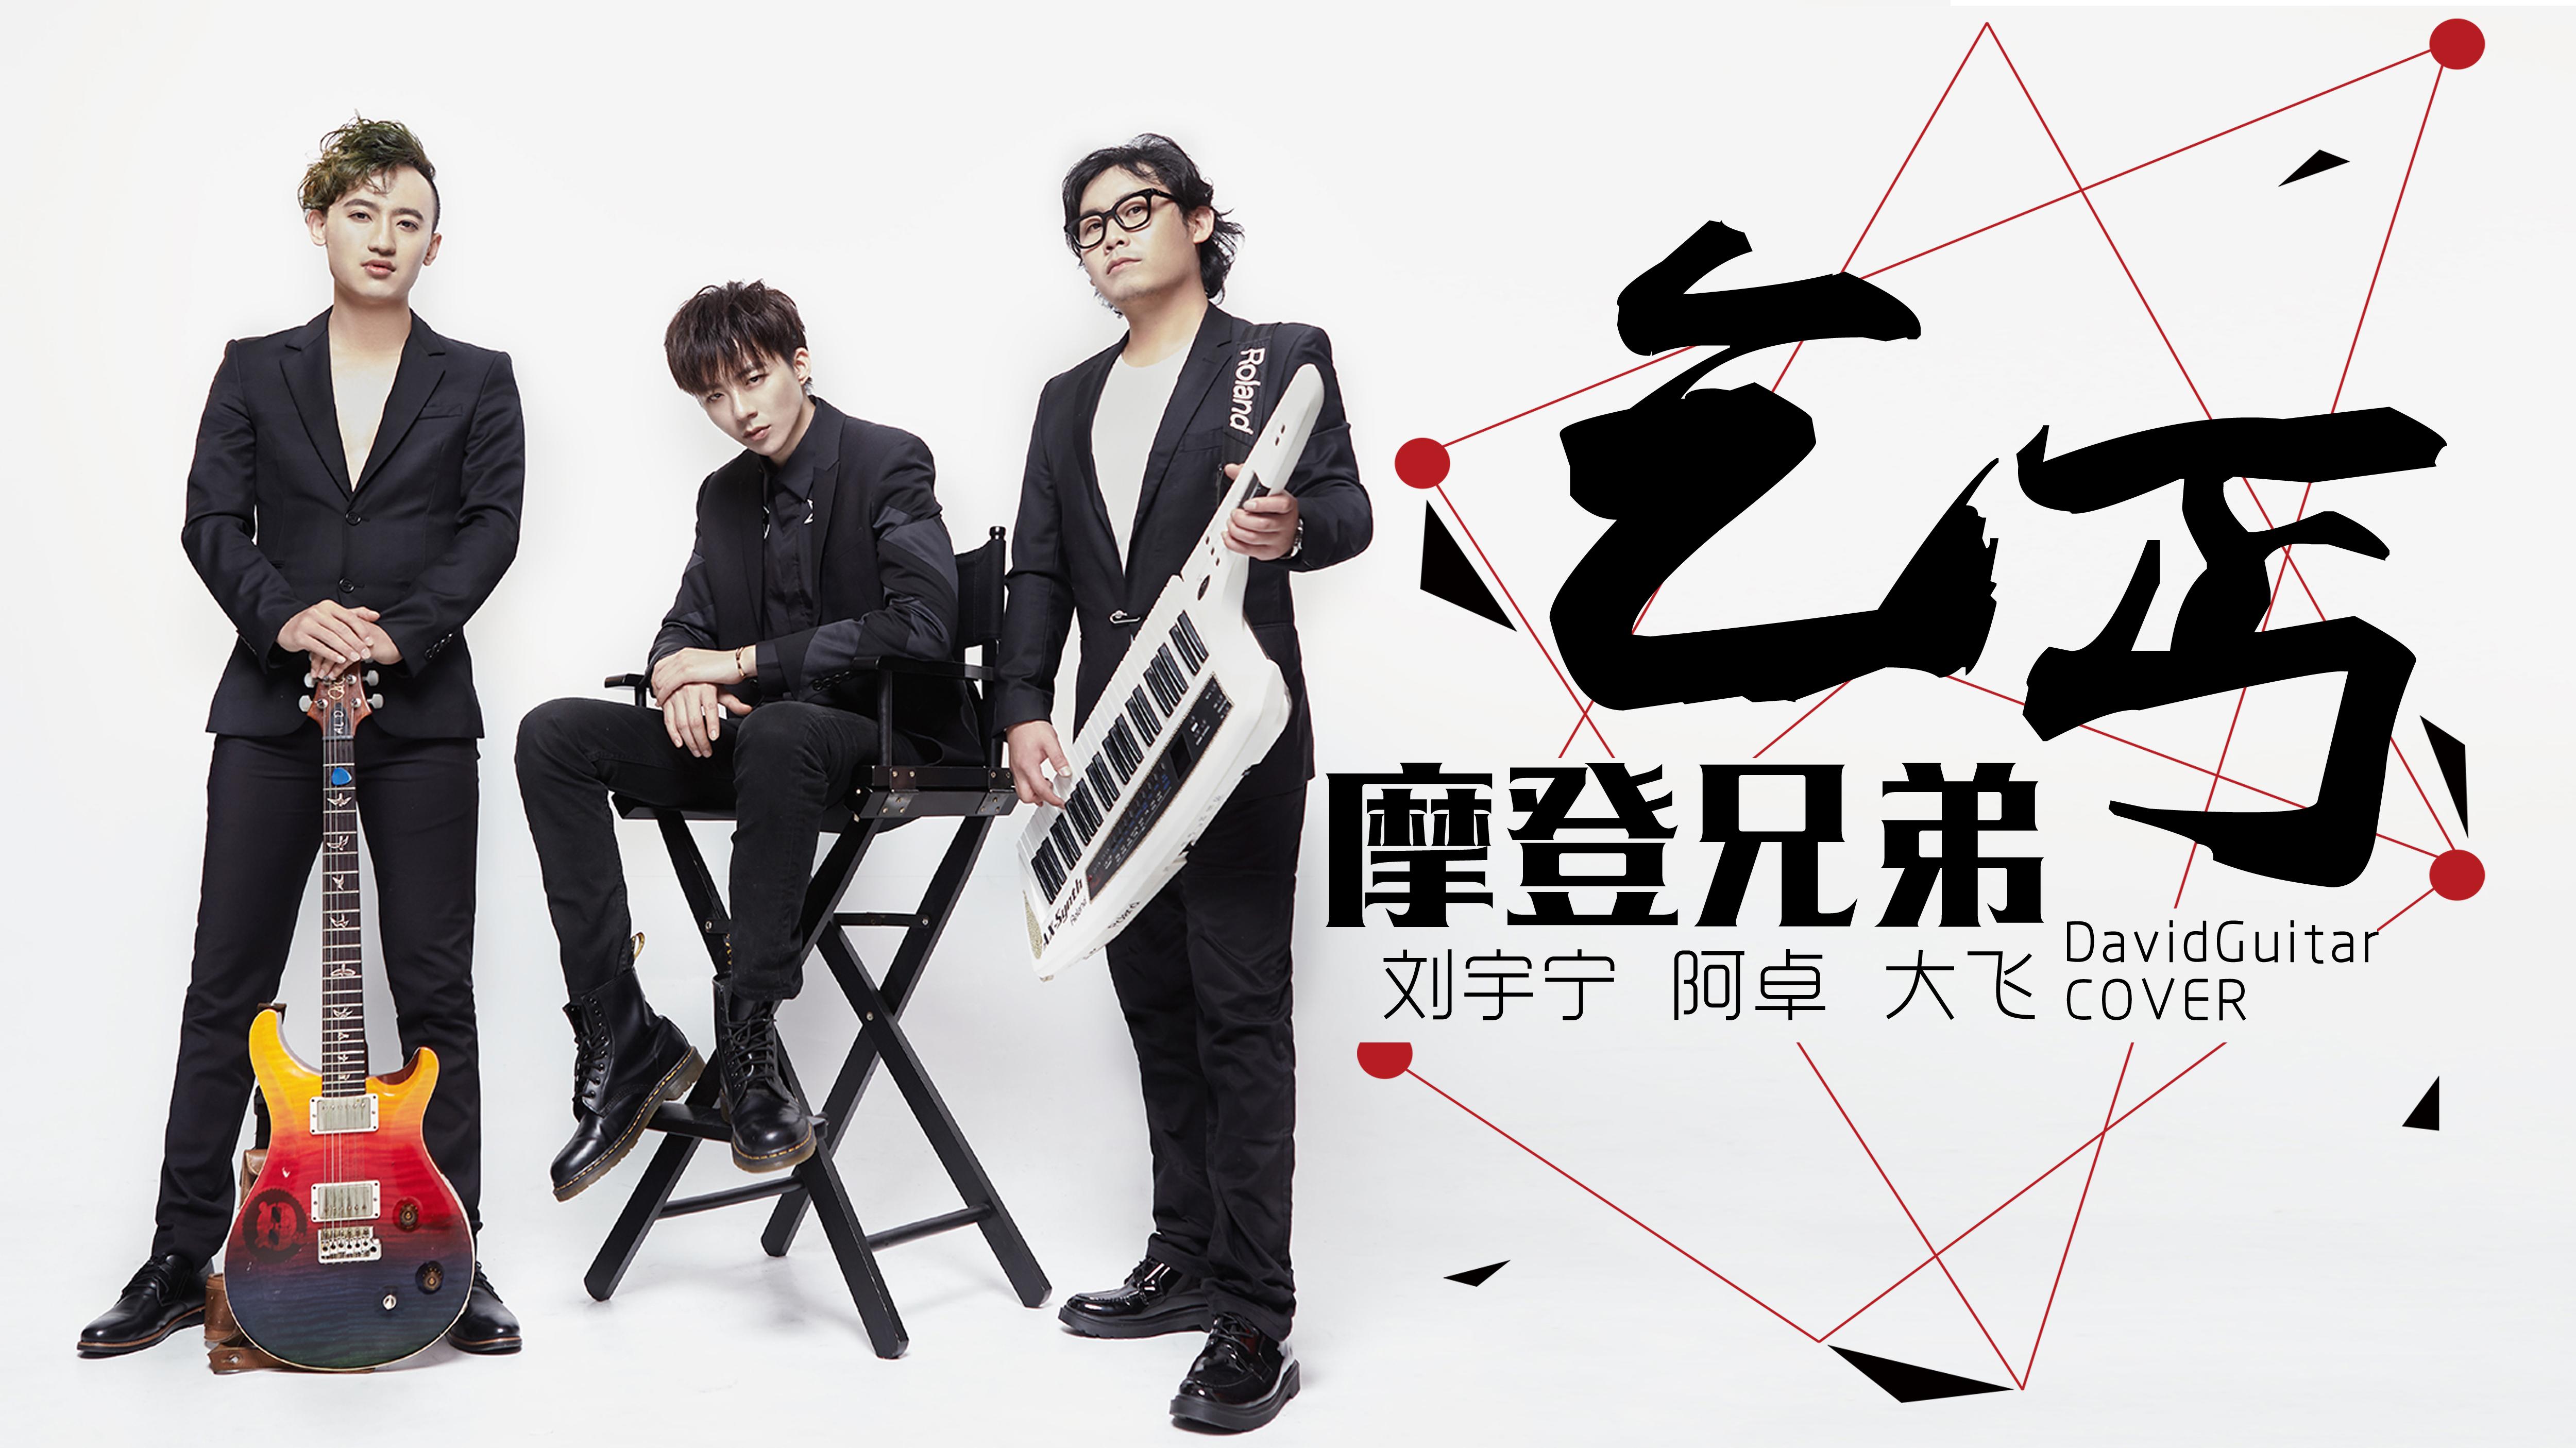 modengxiongdi_qigai_guitar大尺寸